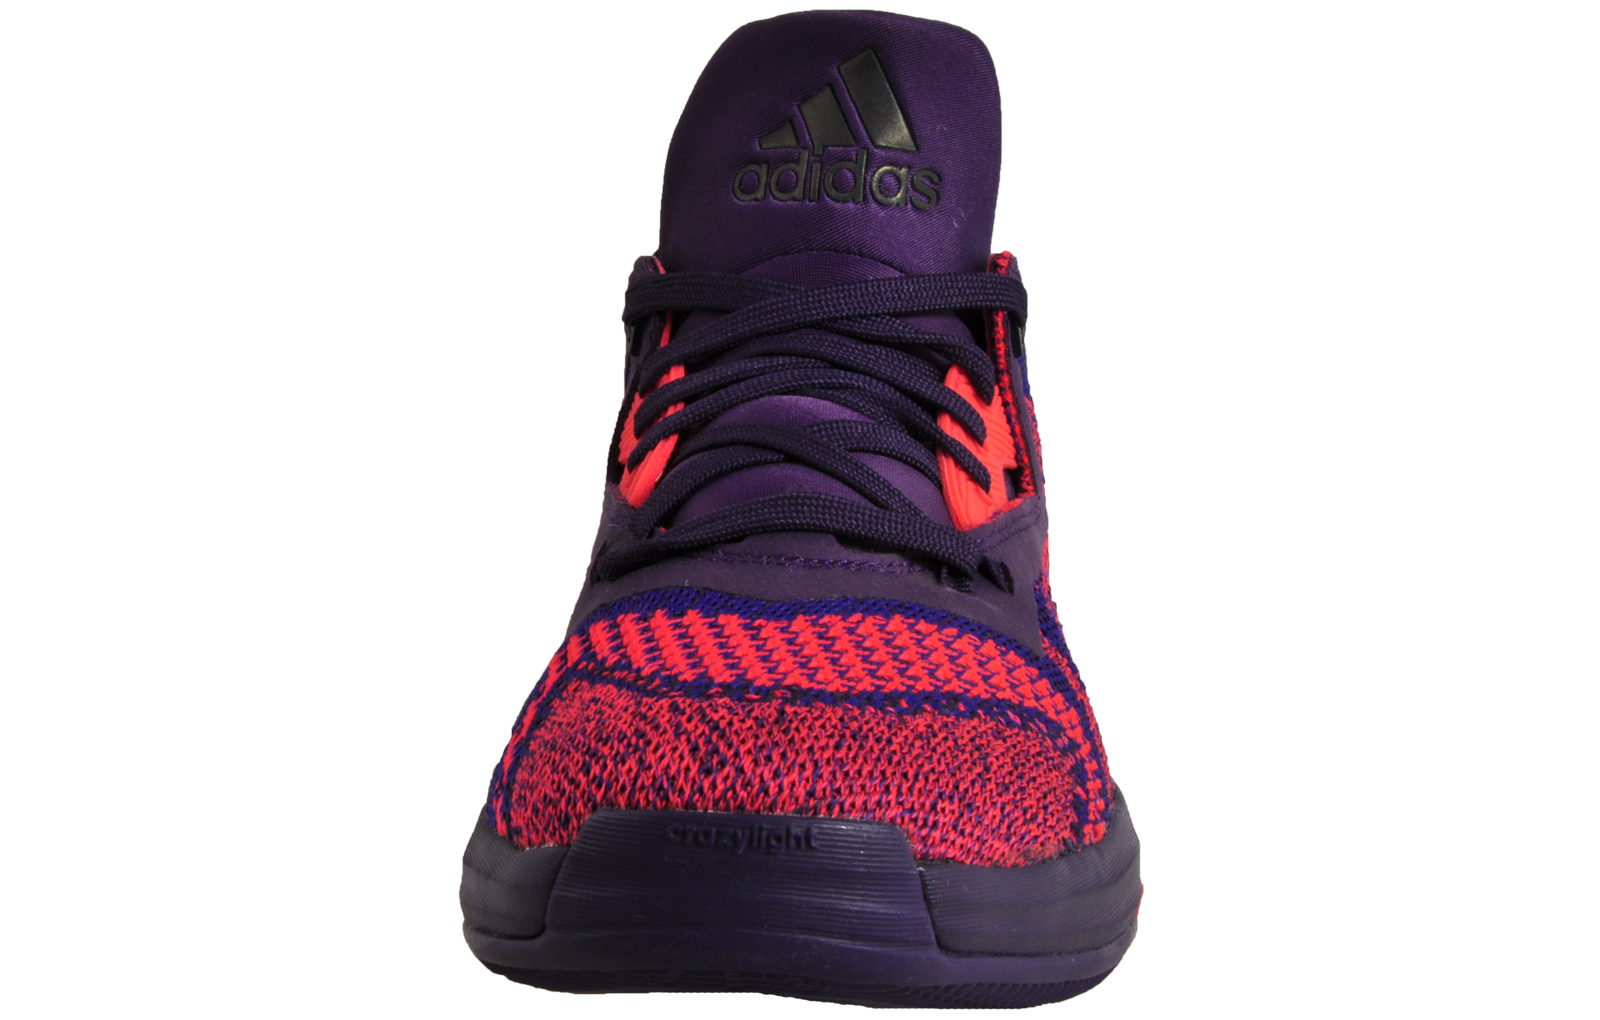 f6fd2dc52 Adidas Damian Lillard 2 Boost Primeknit Para hombres Baloncesto ...